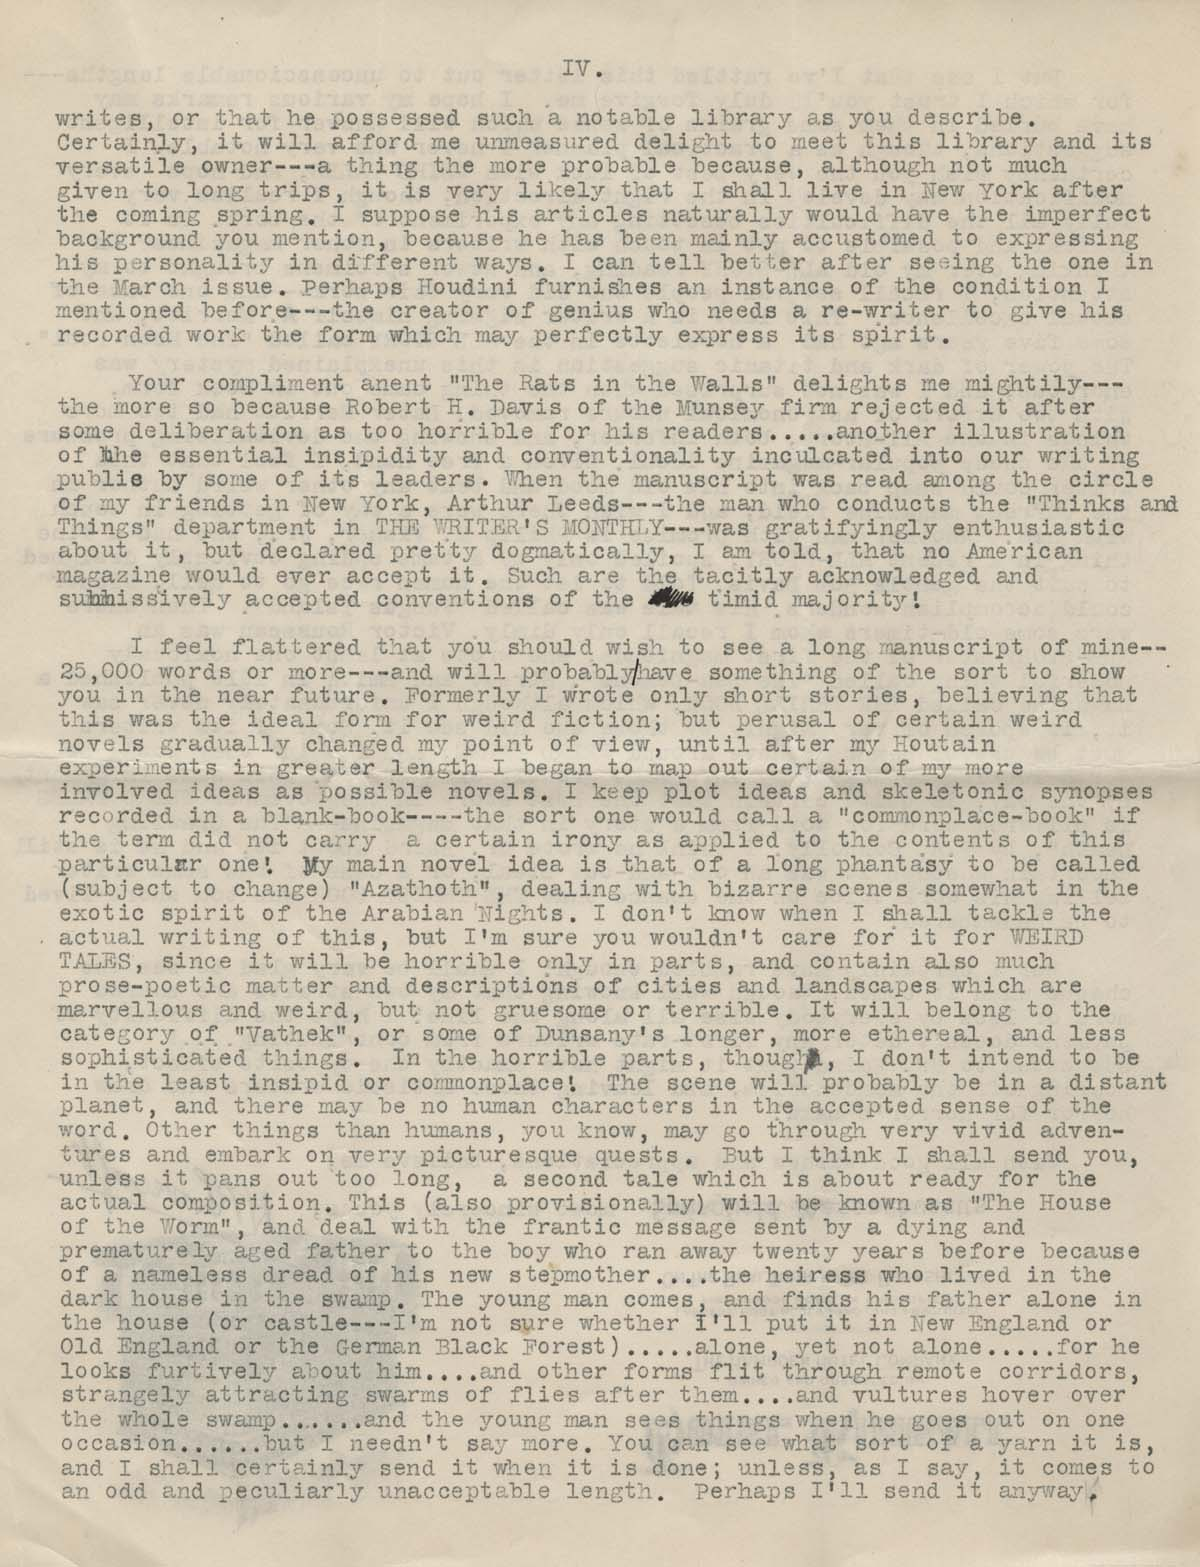 LovecraftHP_Letters_HennebergerJC_009